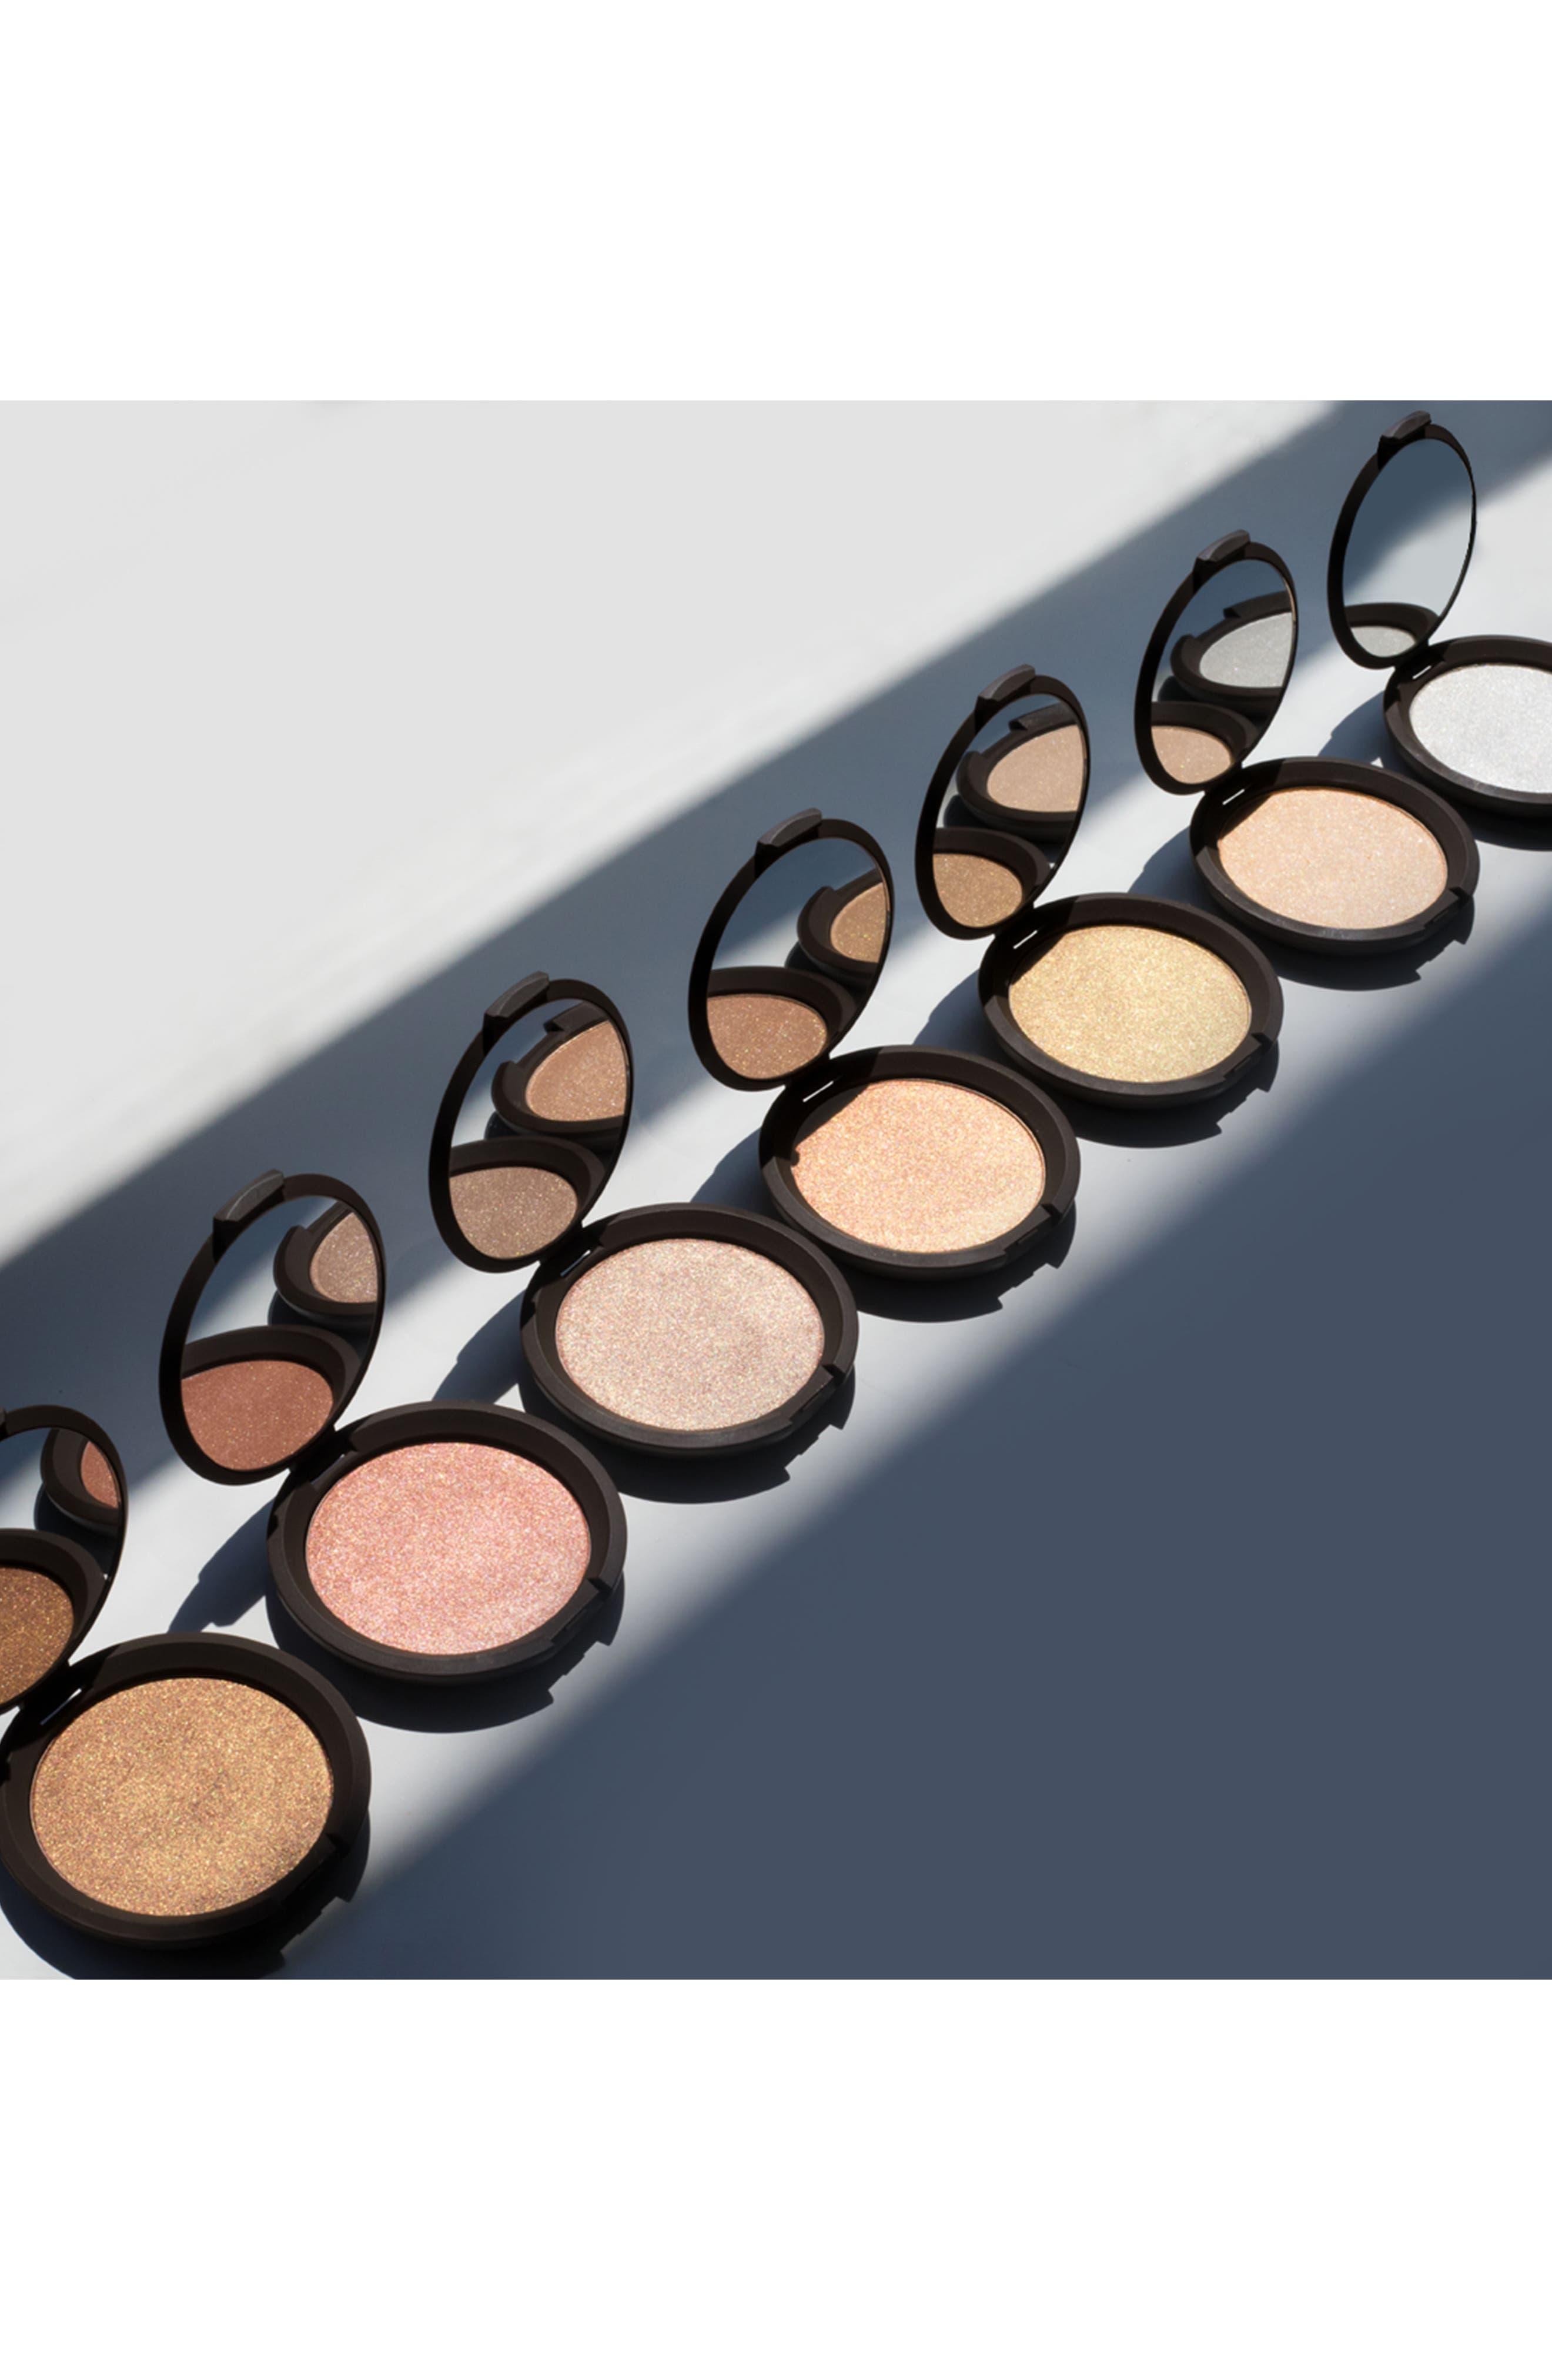 BECCA Shimmering Skin Perfector Pressed Highlighter,                             Alternate thumbnail 7, color,